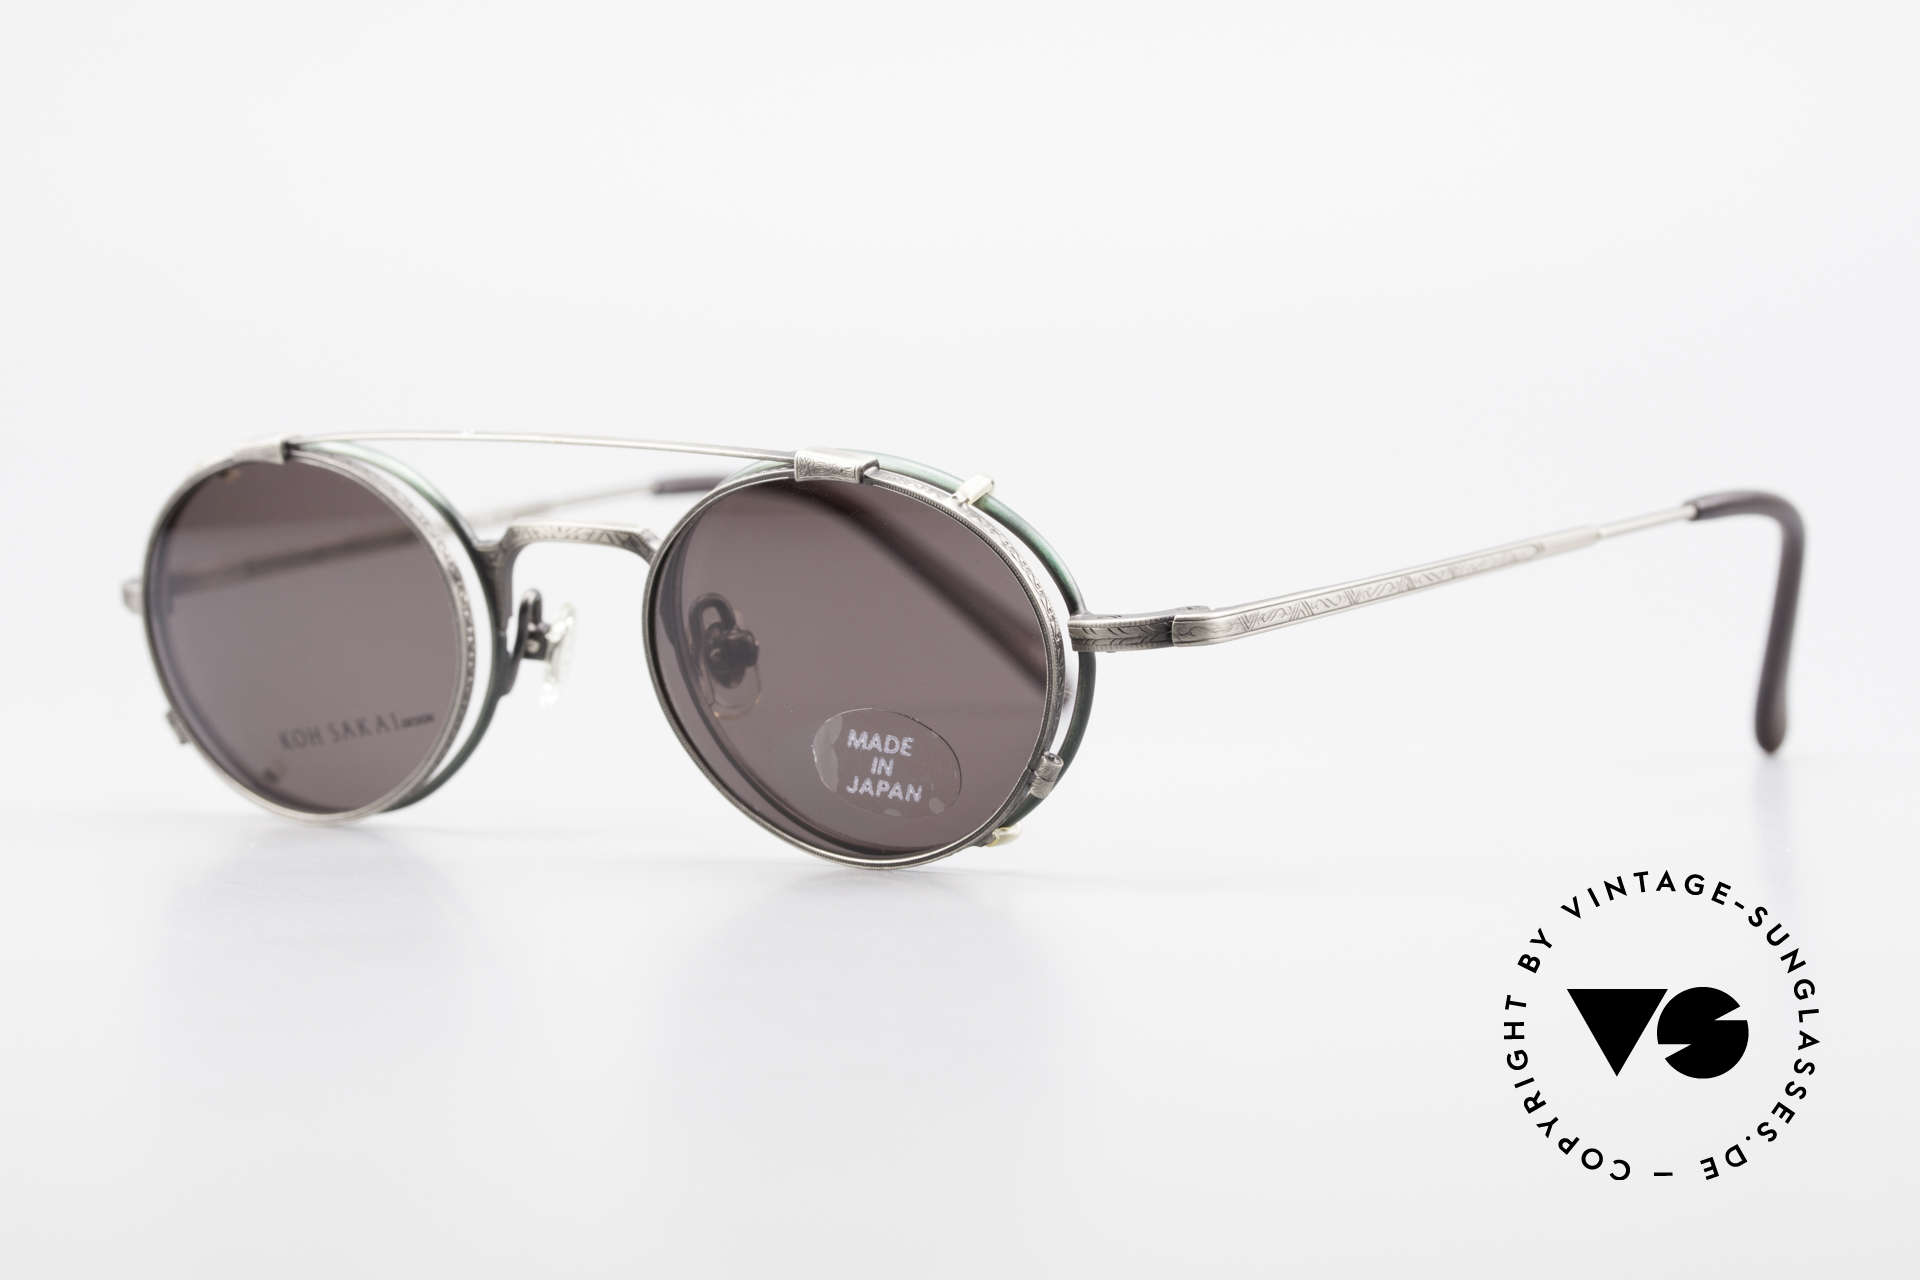 Koh Sakai KS9301 90er Oliver Peoples Eyevan Stil, in Los Angeles designed & in Sabae (Japan) produziert, Passend für Herren